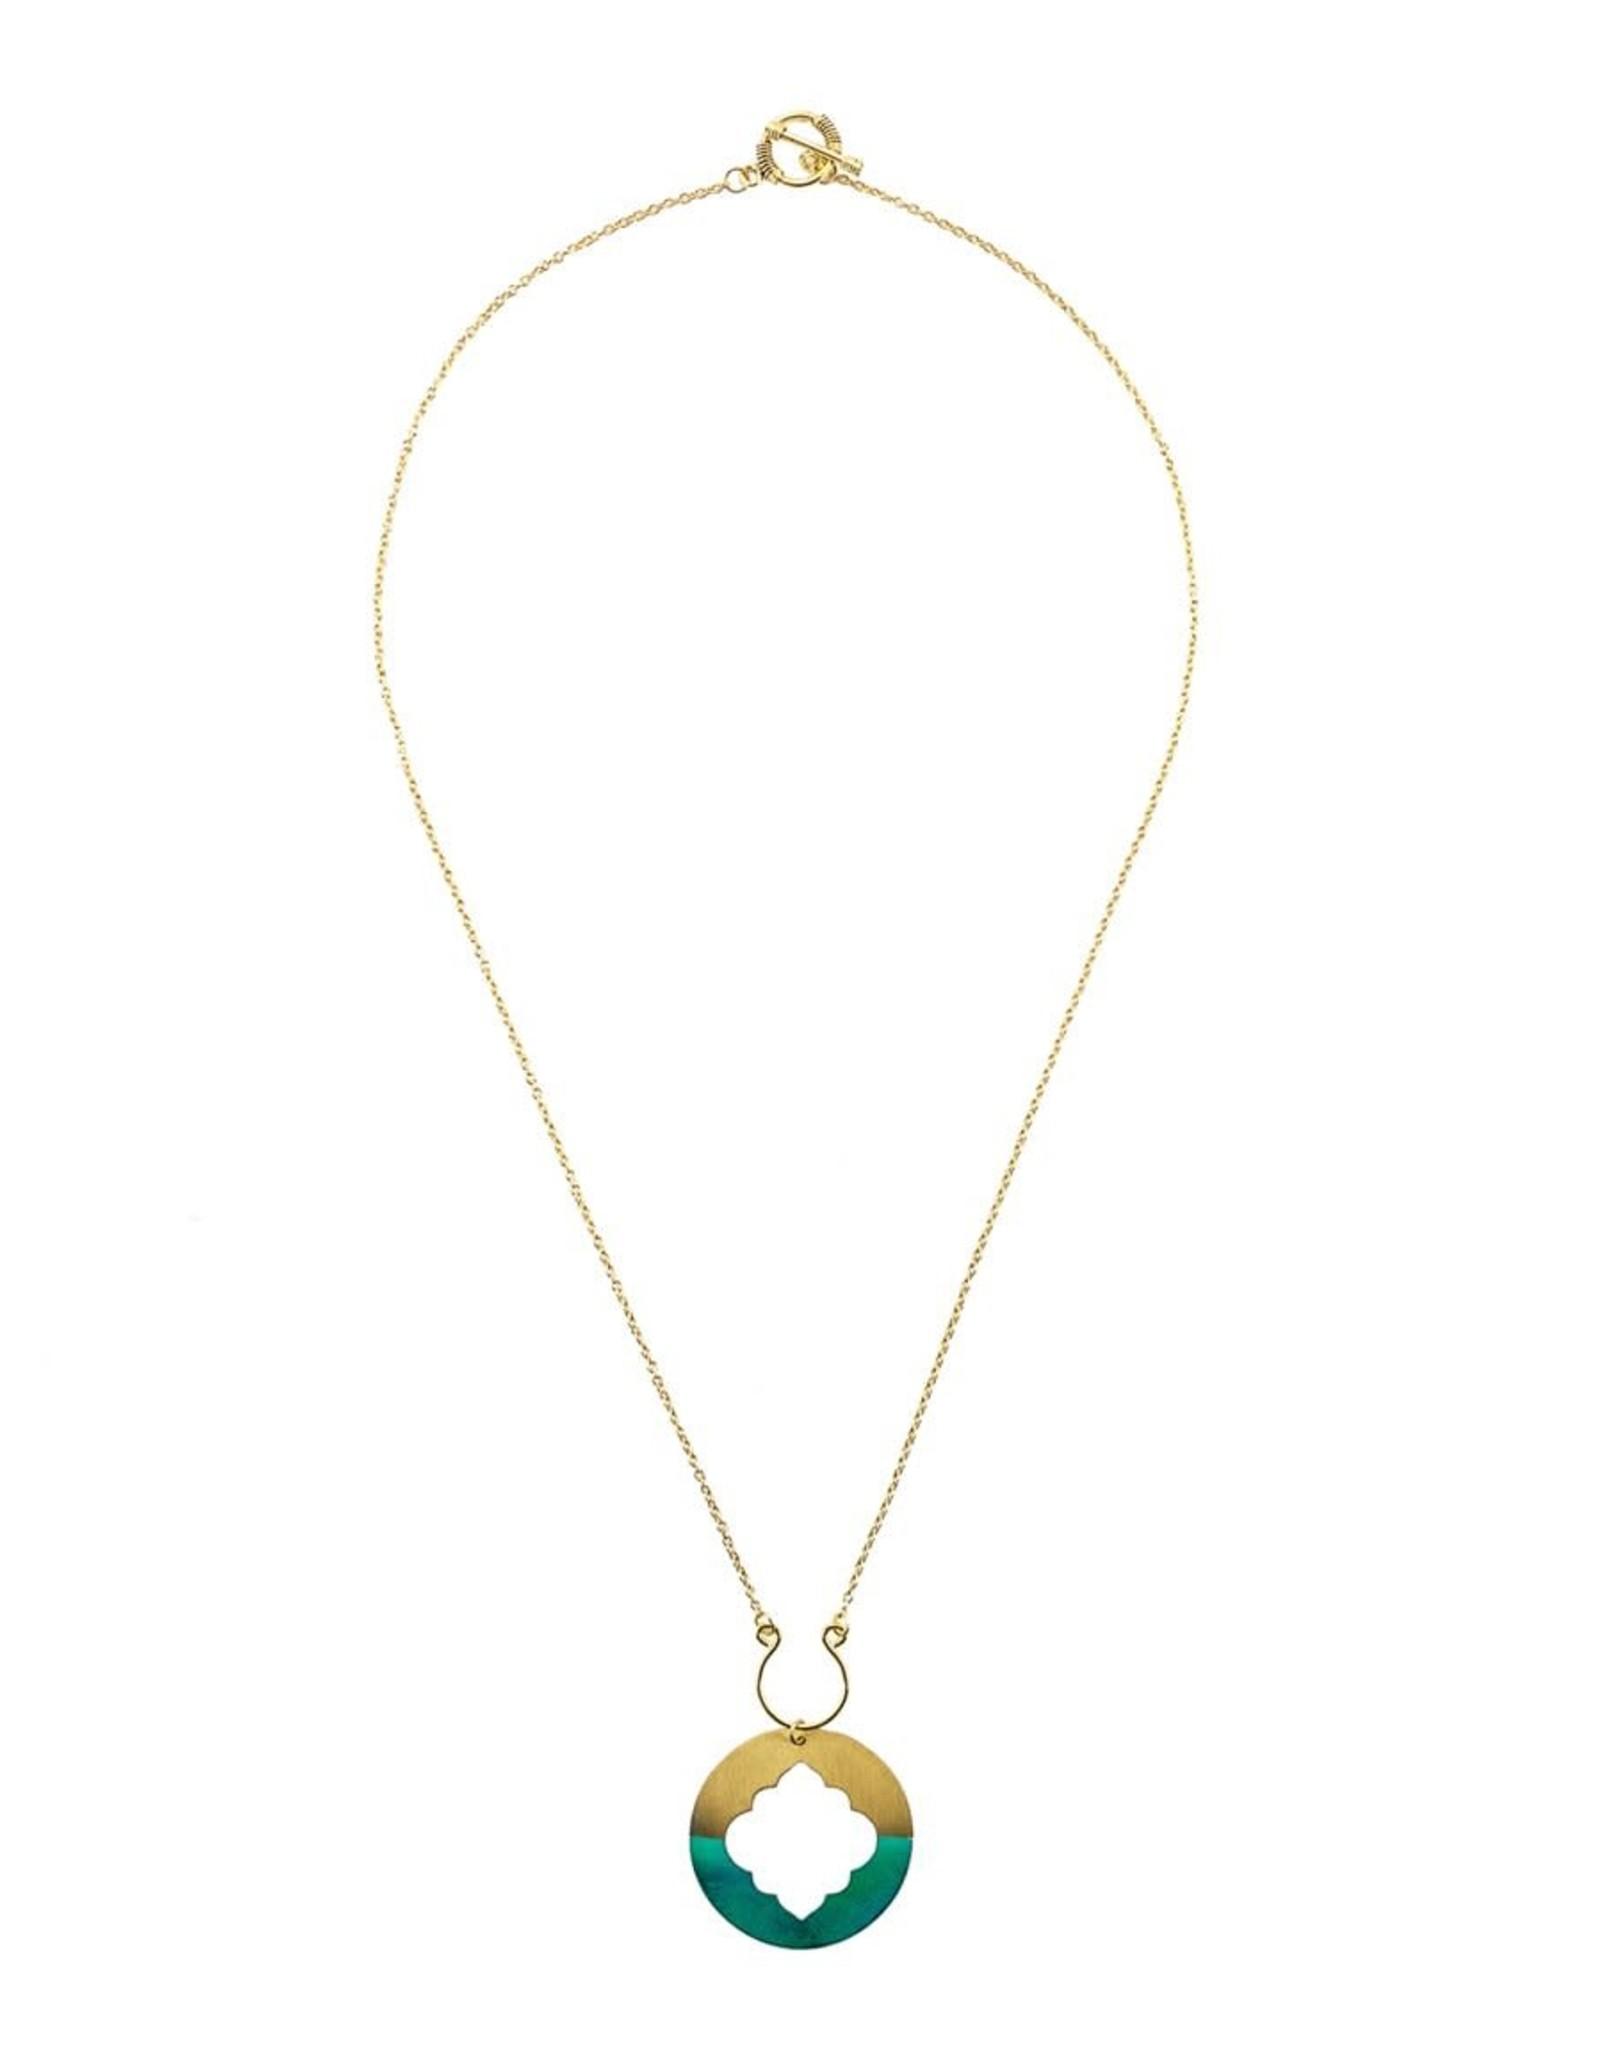 Matr Boomie Ashram Window necklace gold patina